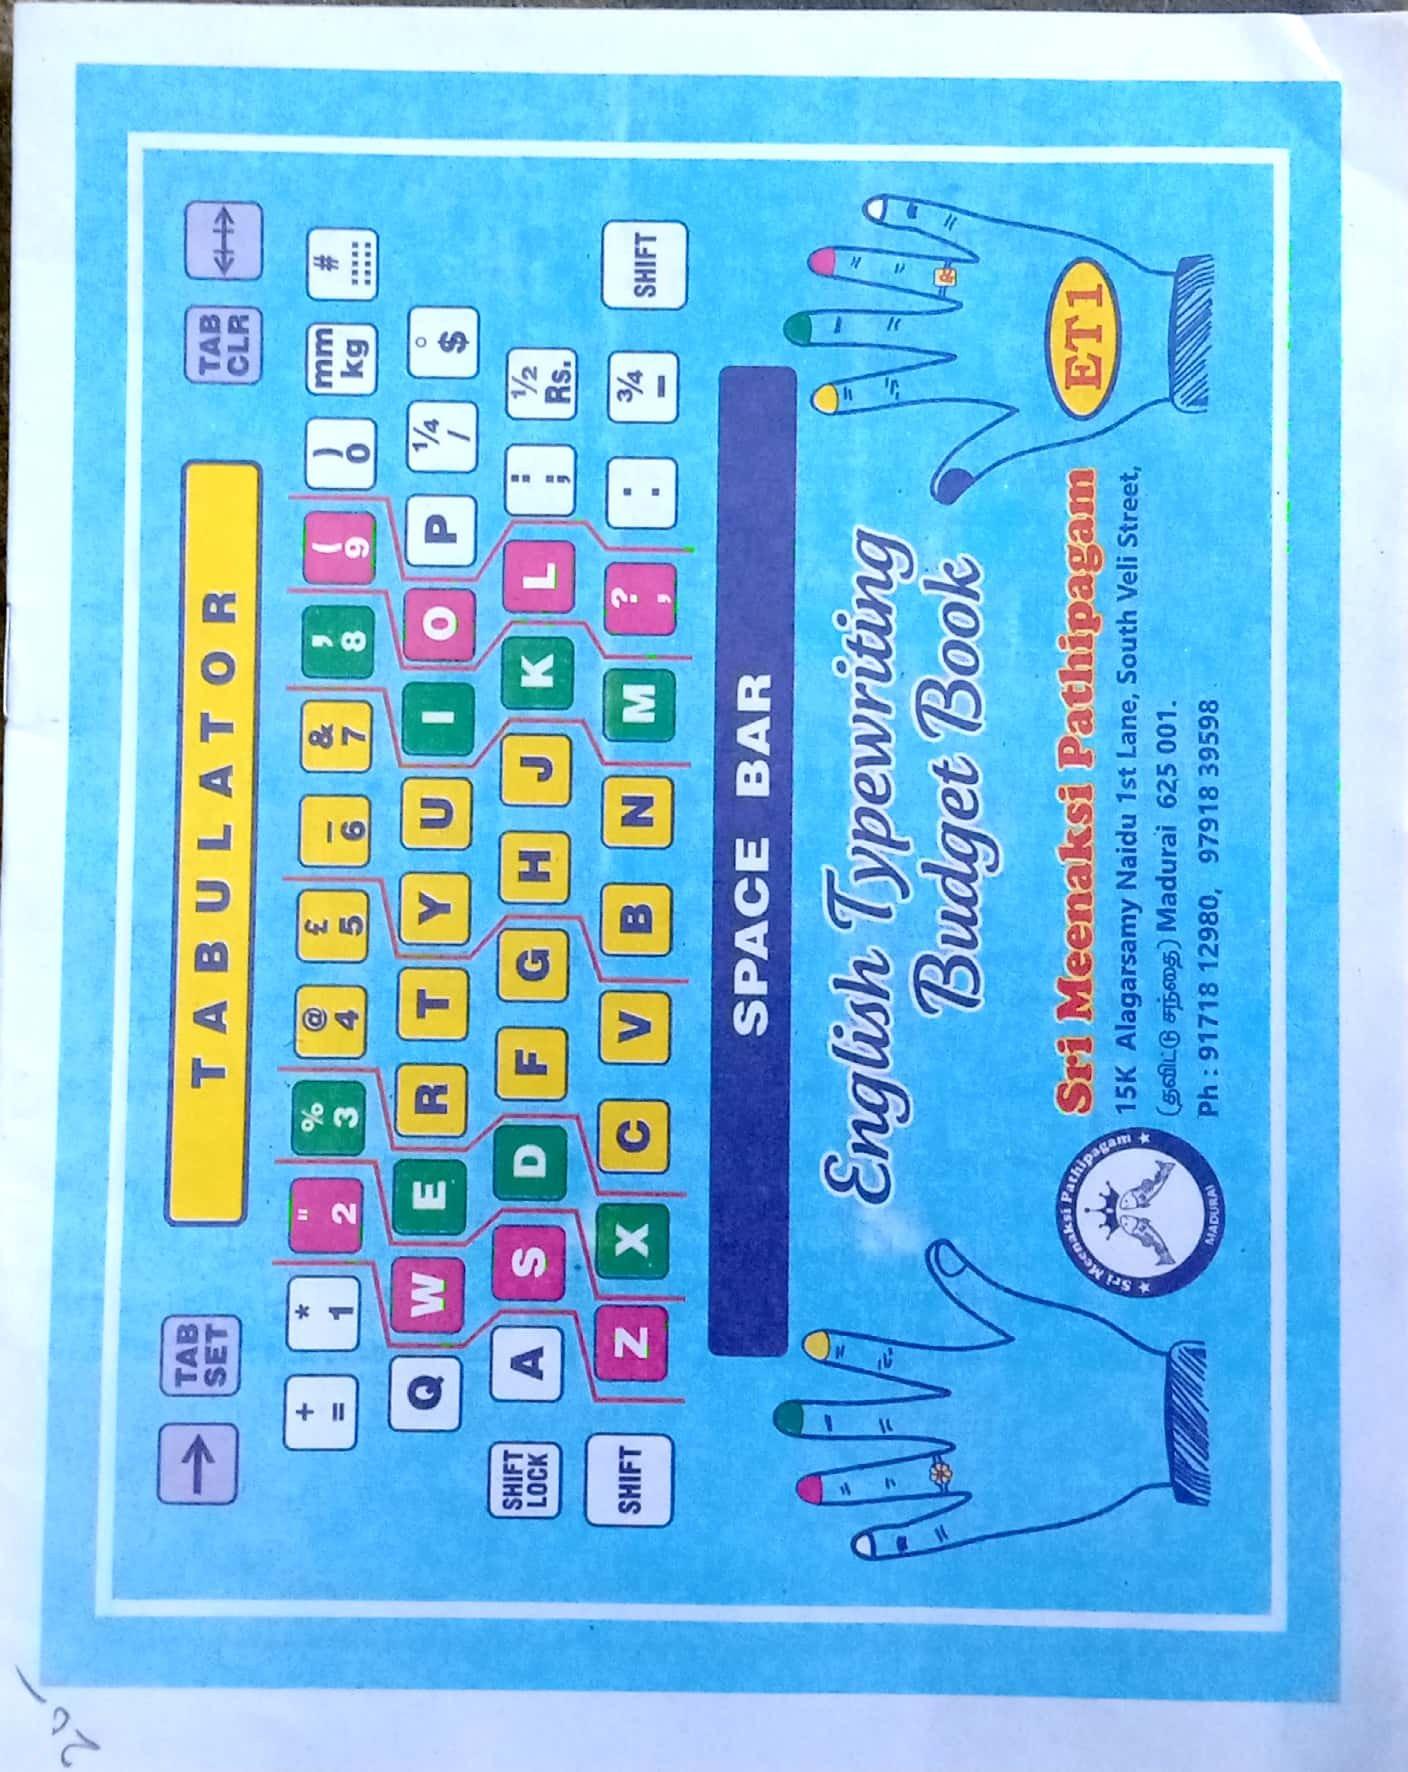 English spell checker online